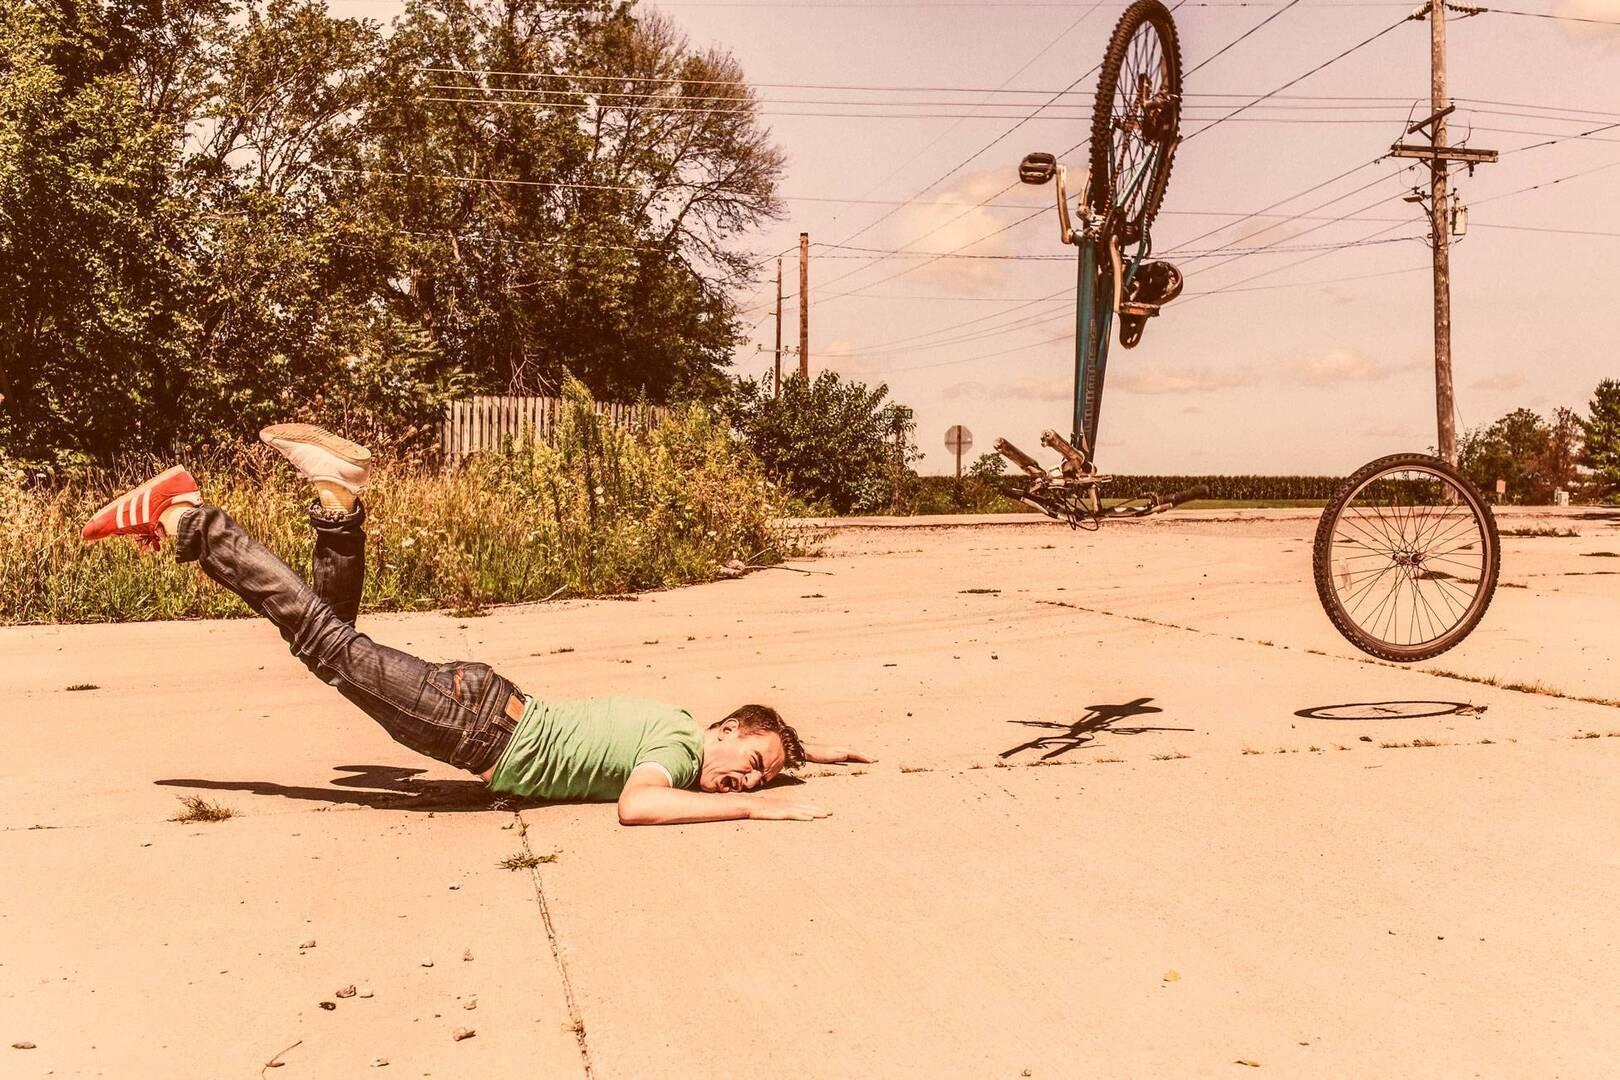 guy crashing on his bike